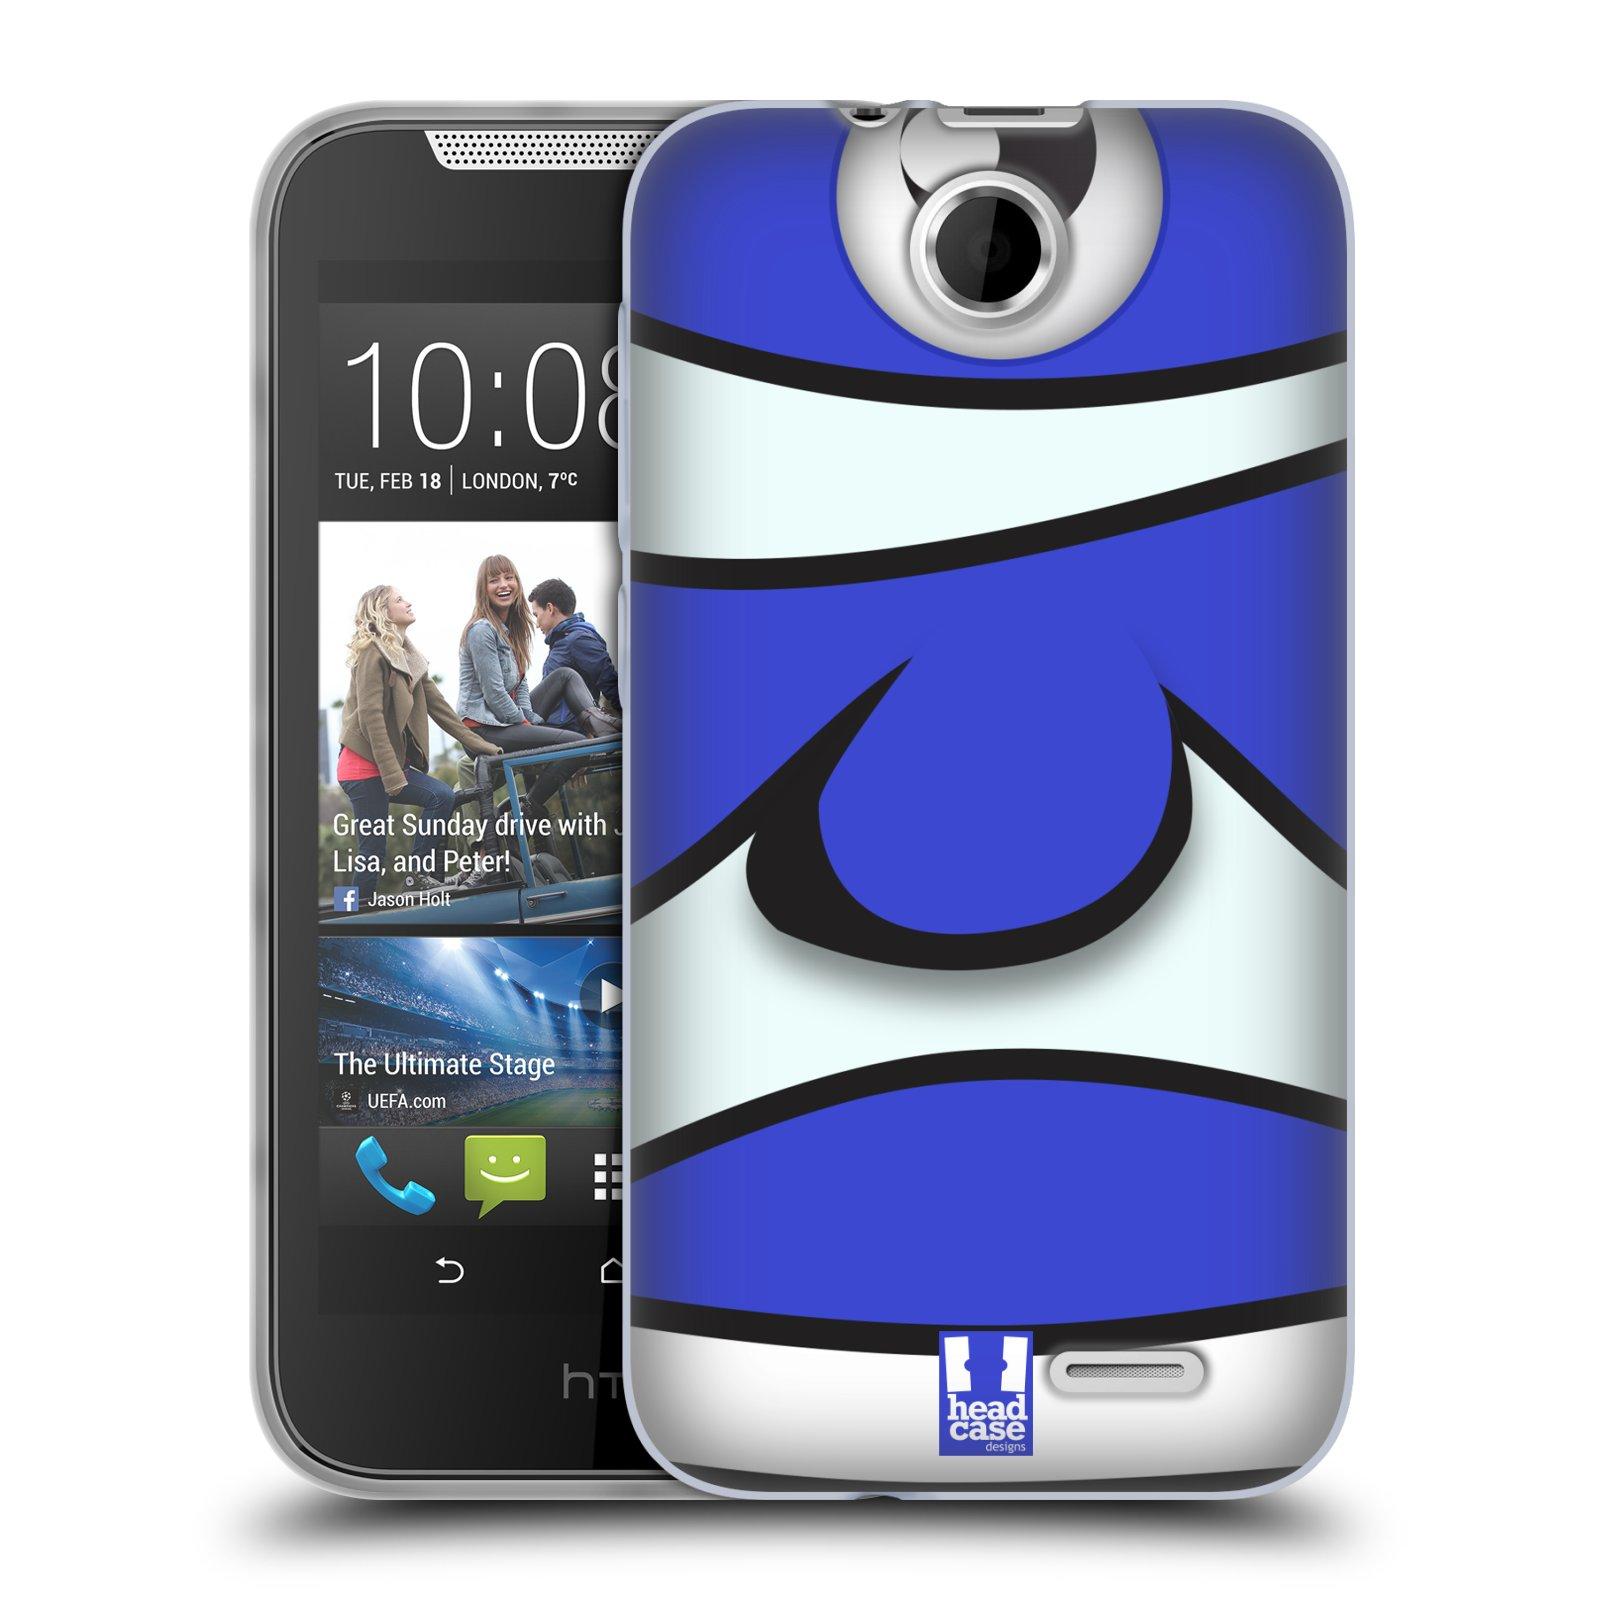 HEAD CASE silikonový obal na mobil HTC DESIRE 310 vzor Rybičky z profilu modrý klaun